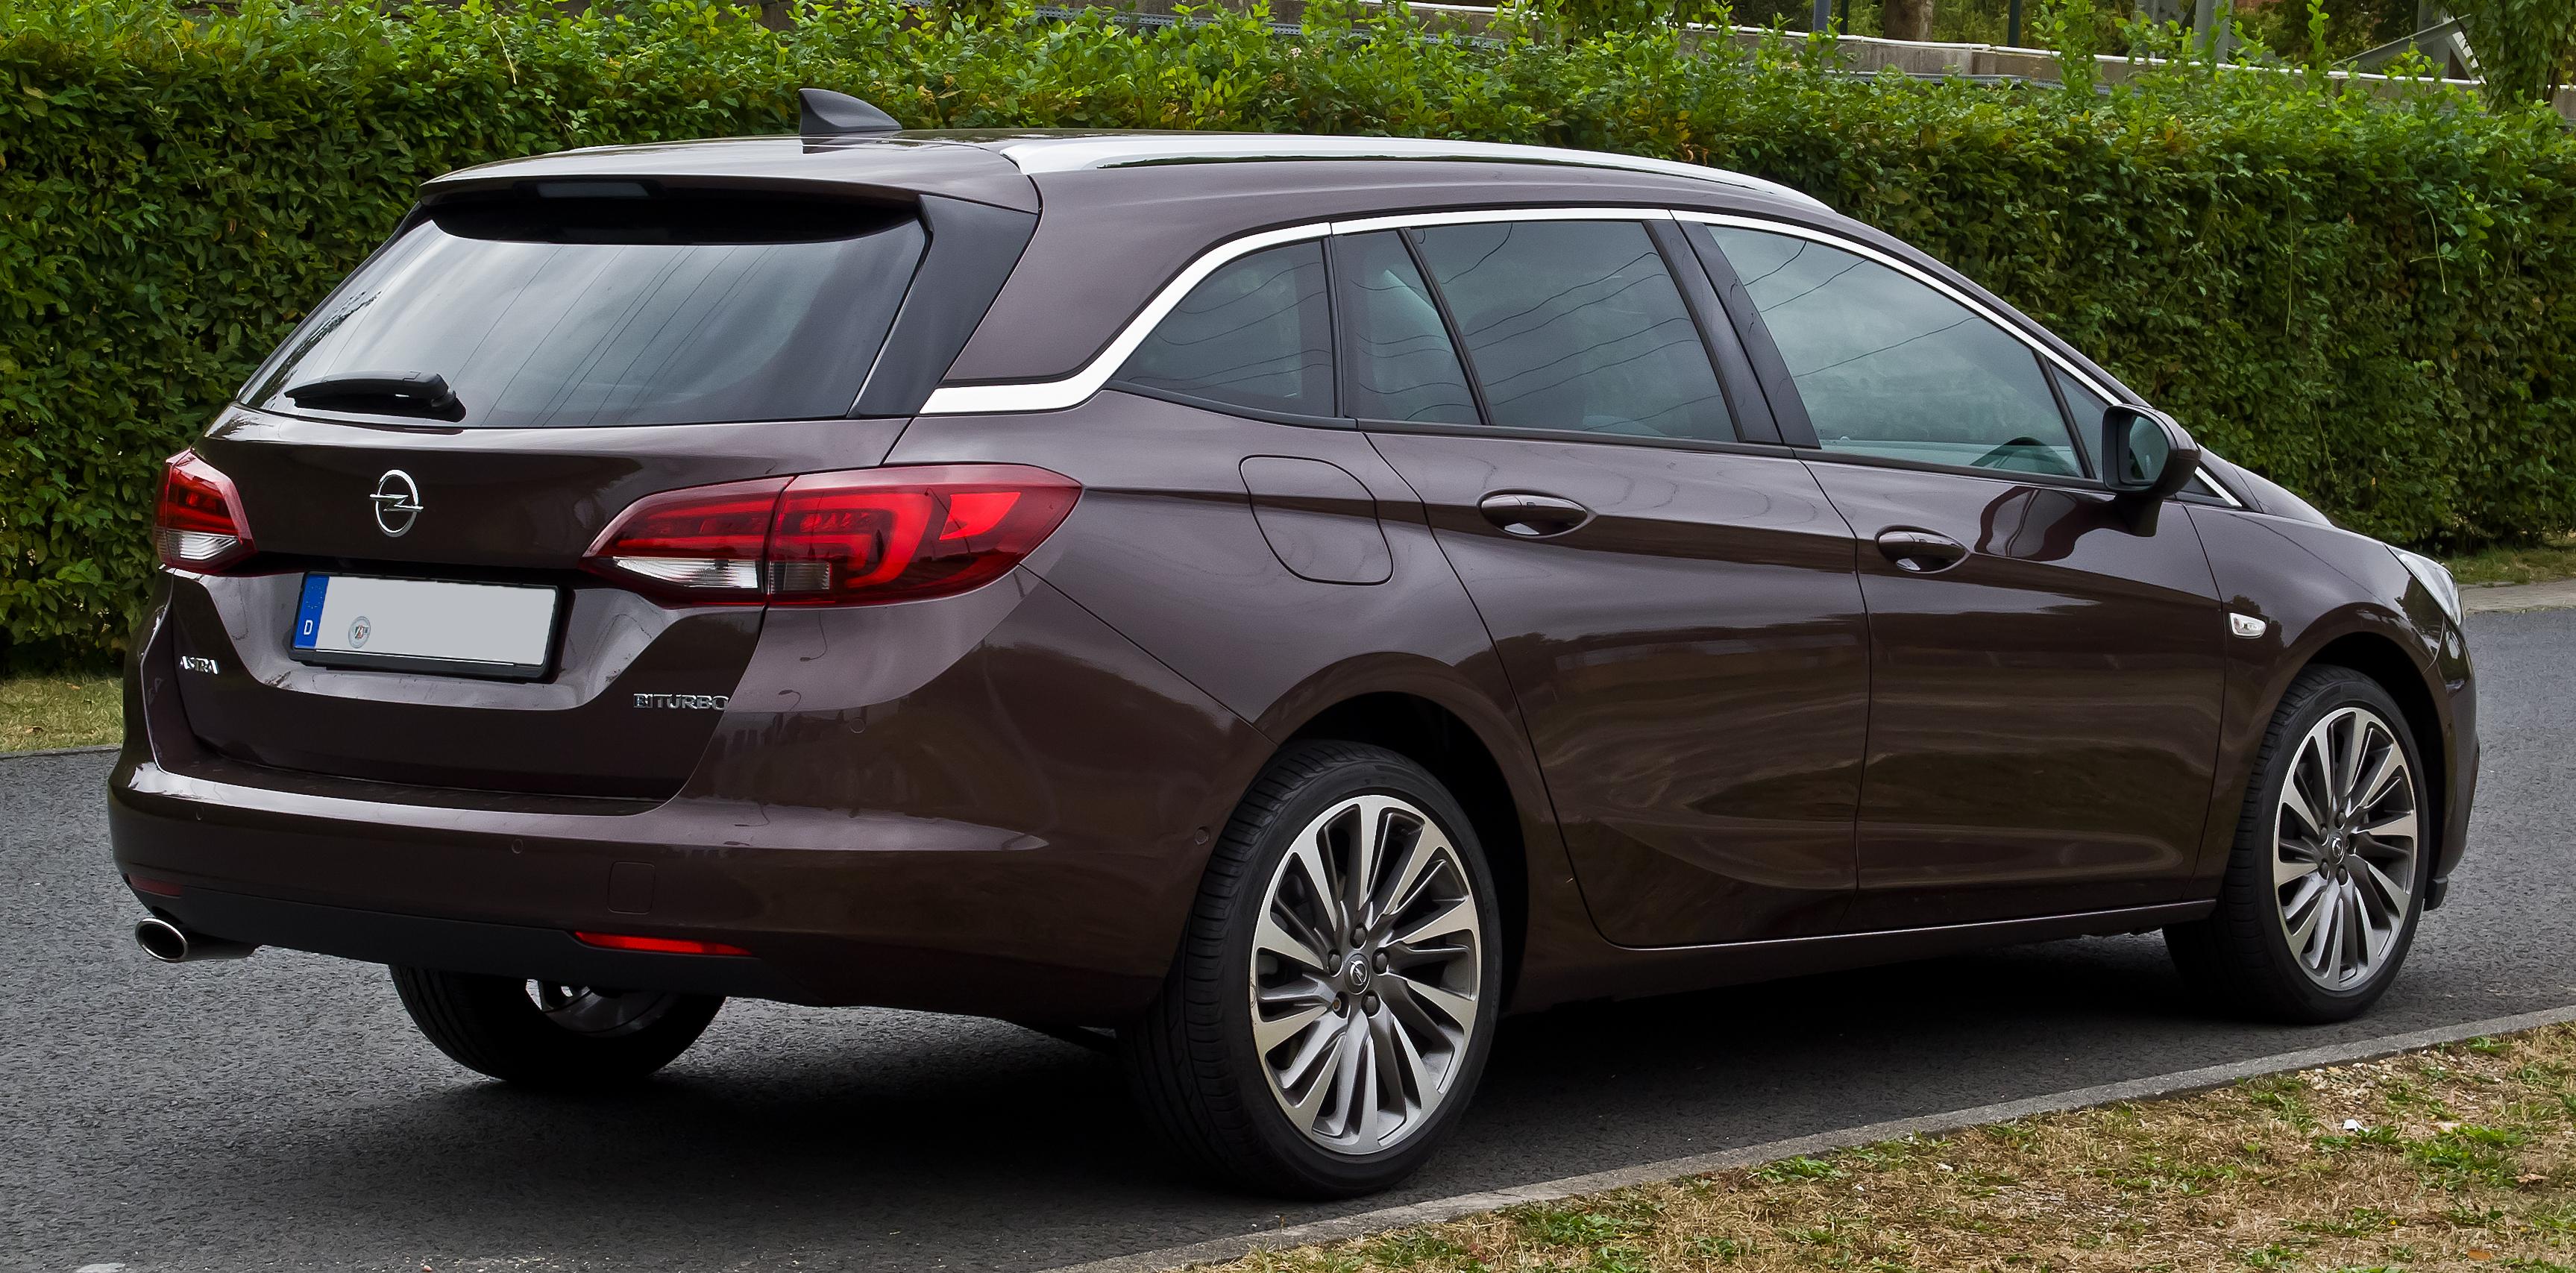 File:Opel Astra Sports Tourer 1.6 BiTurbo CDTI ecoFLEX Innovation (K) – Heckansicht, 28 ...